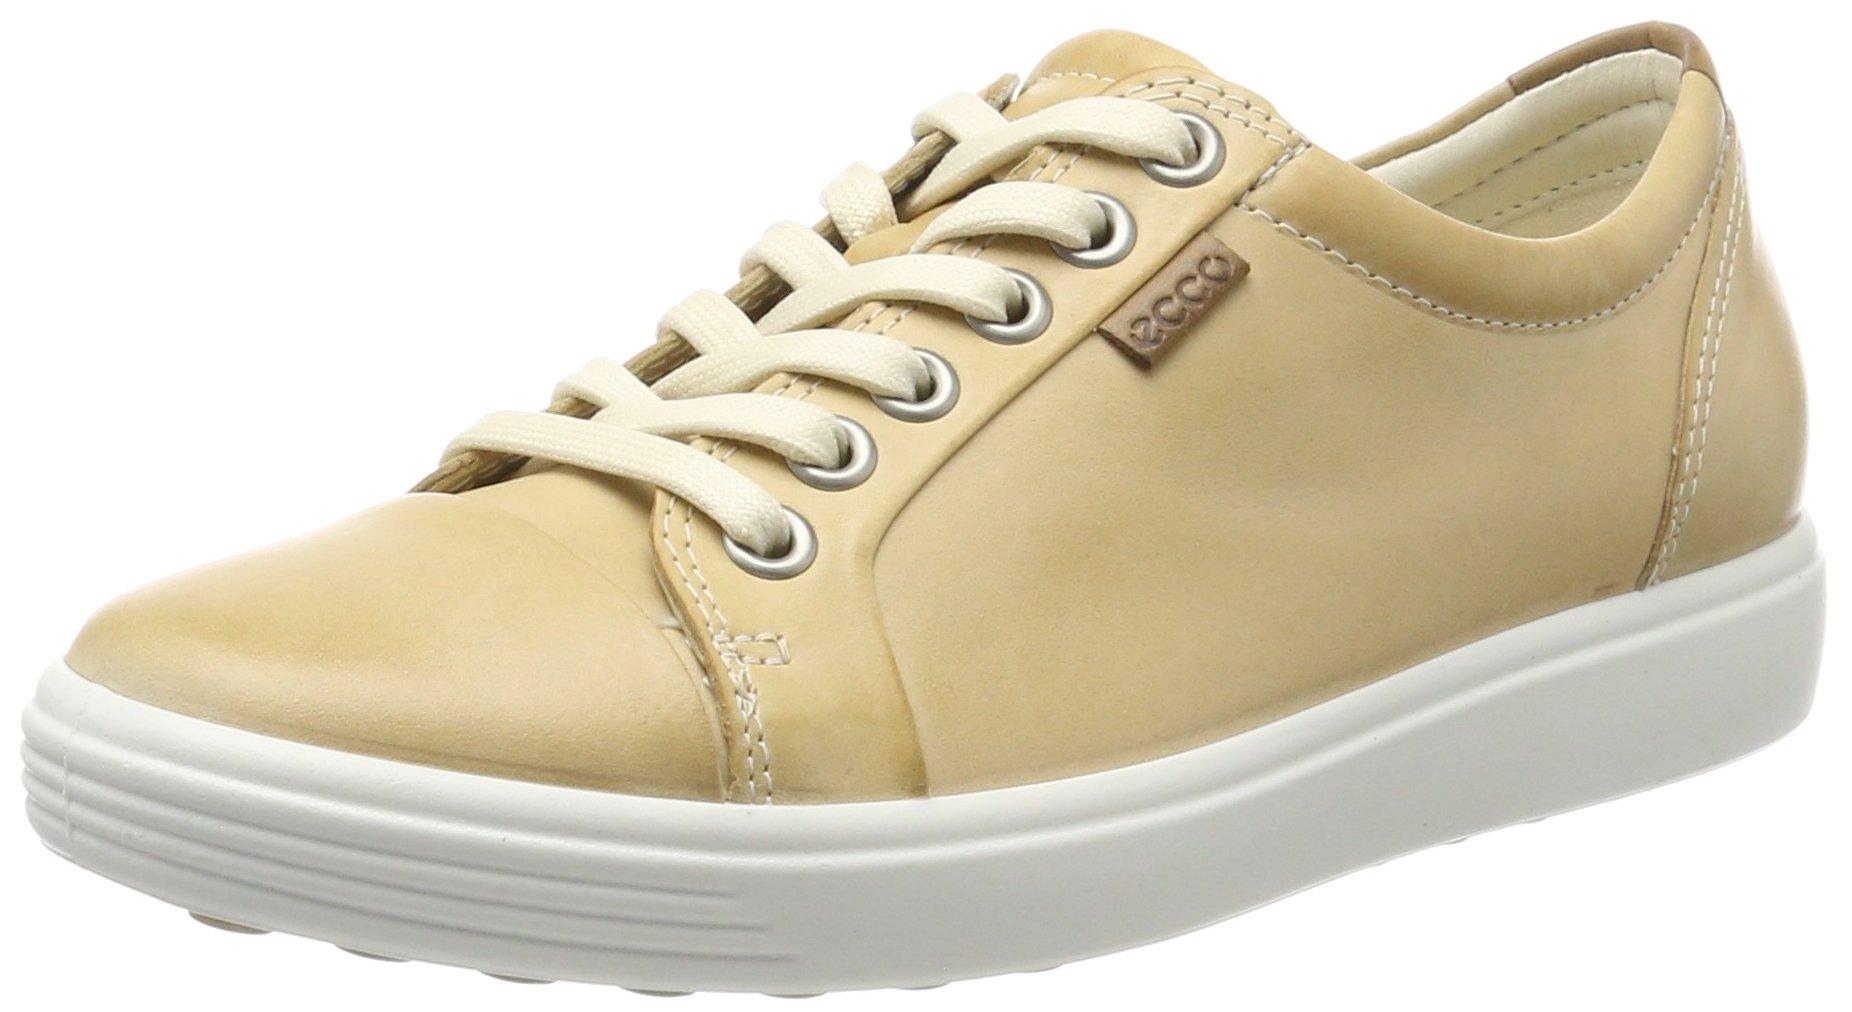 7 Basses Eu Soft FemmeBeigepowder42 Ecco LadiesSneakers QrdCBoExeW